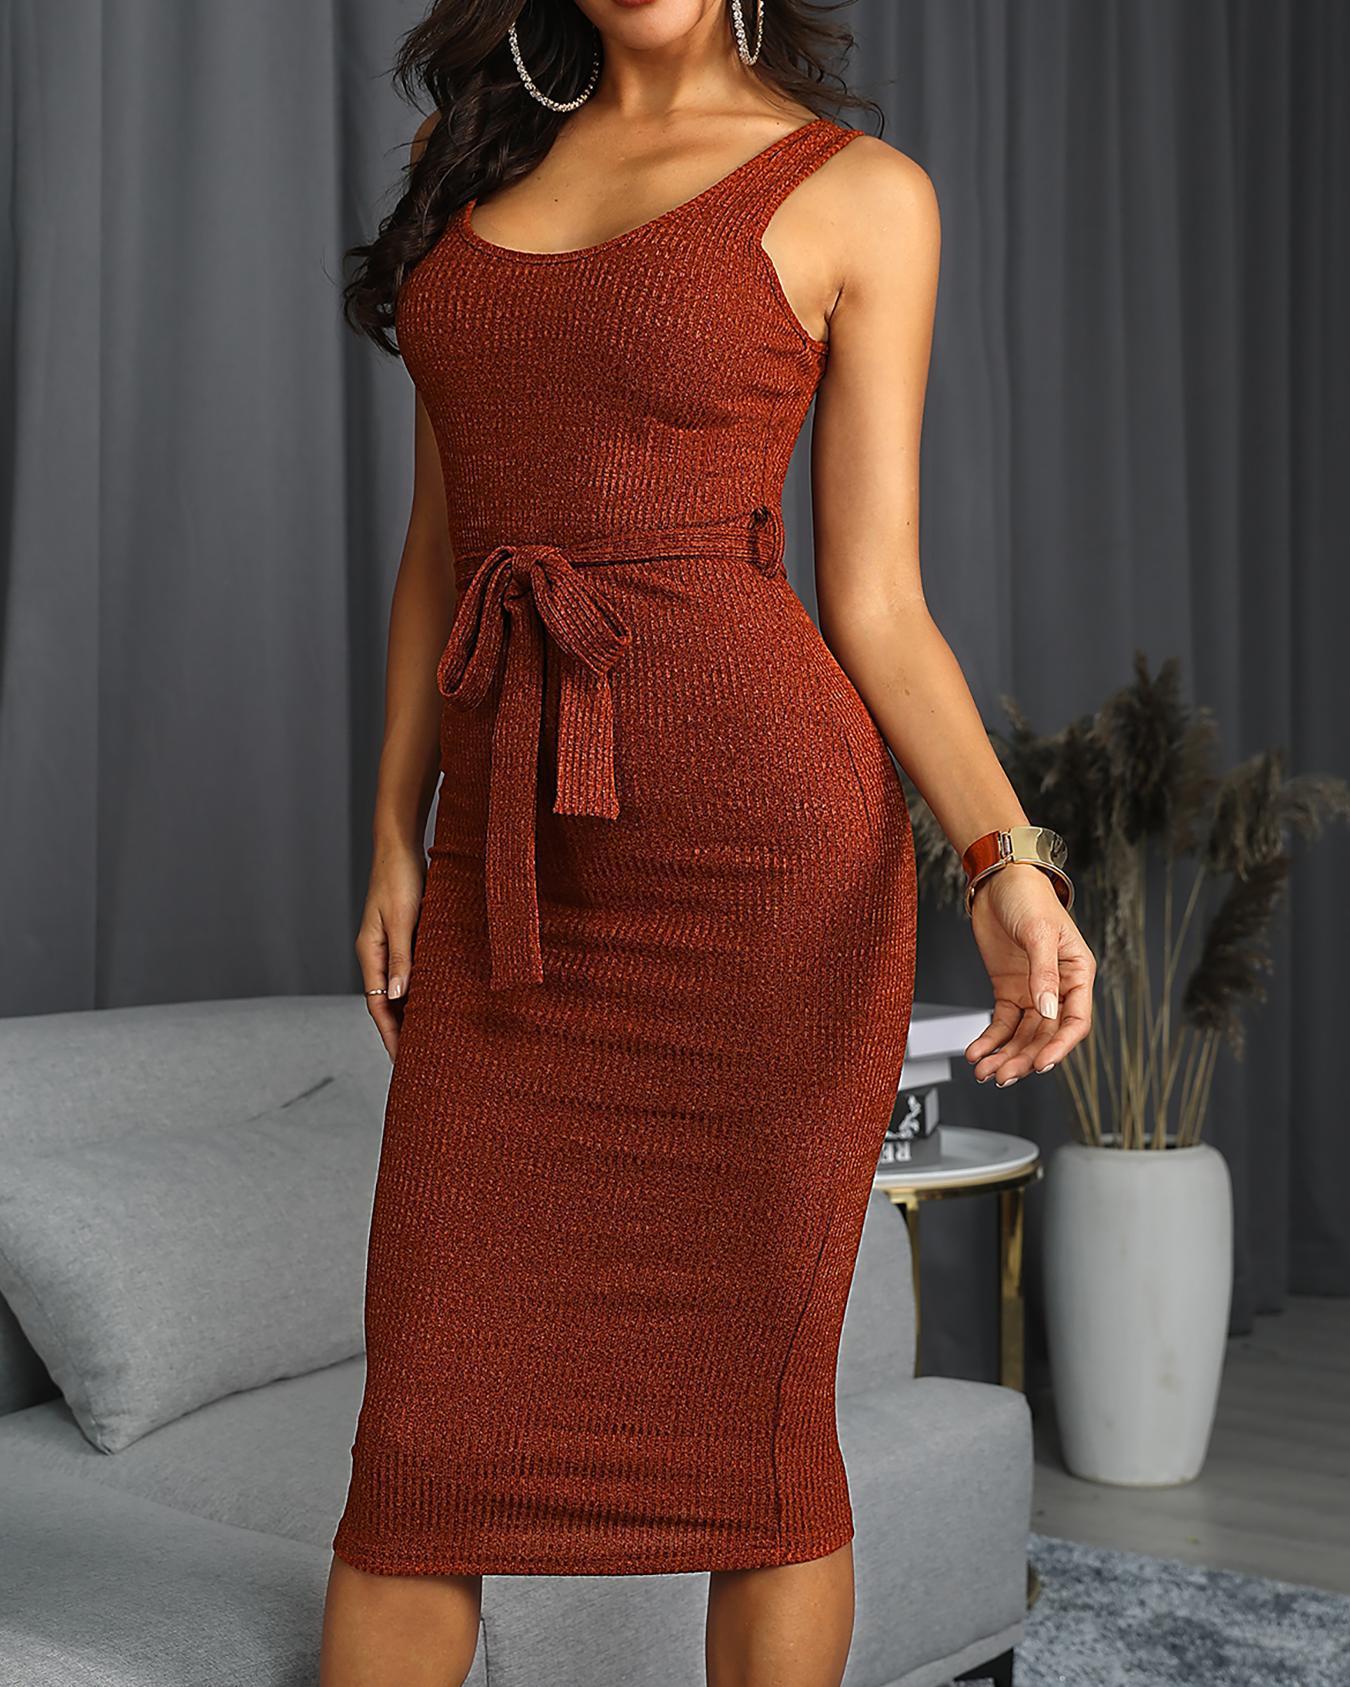 U-Neck Sleeveless Belted Dress